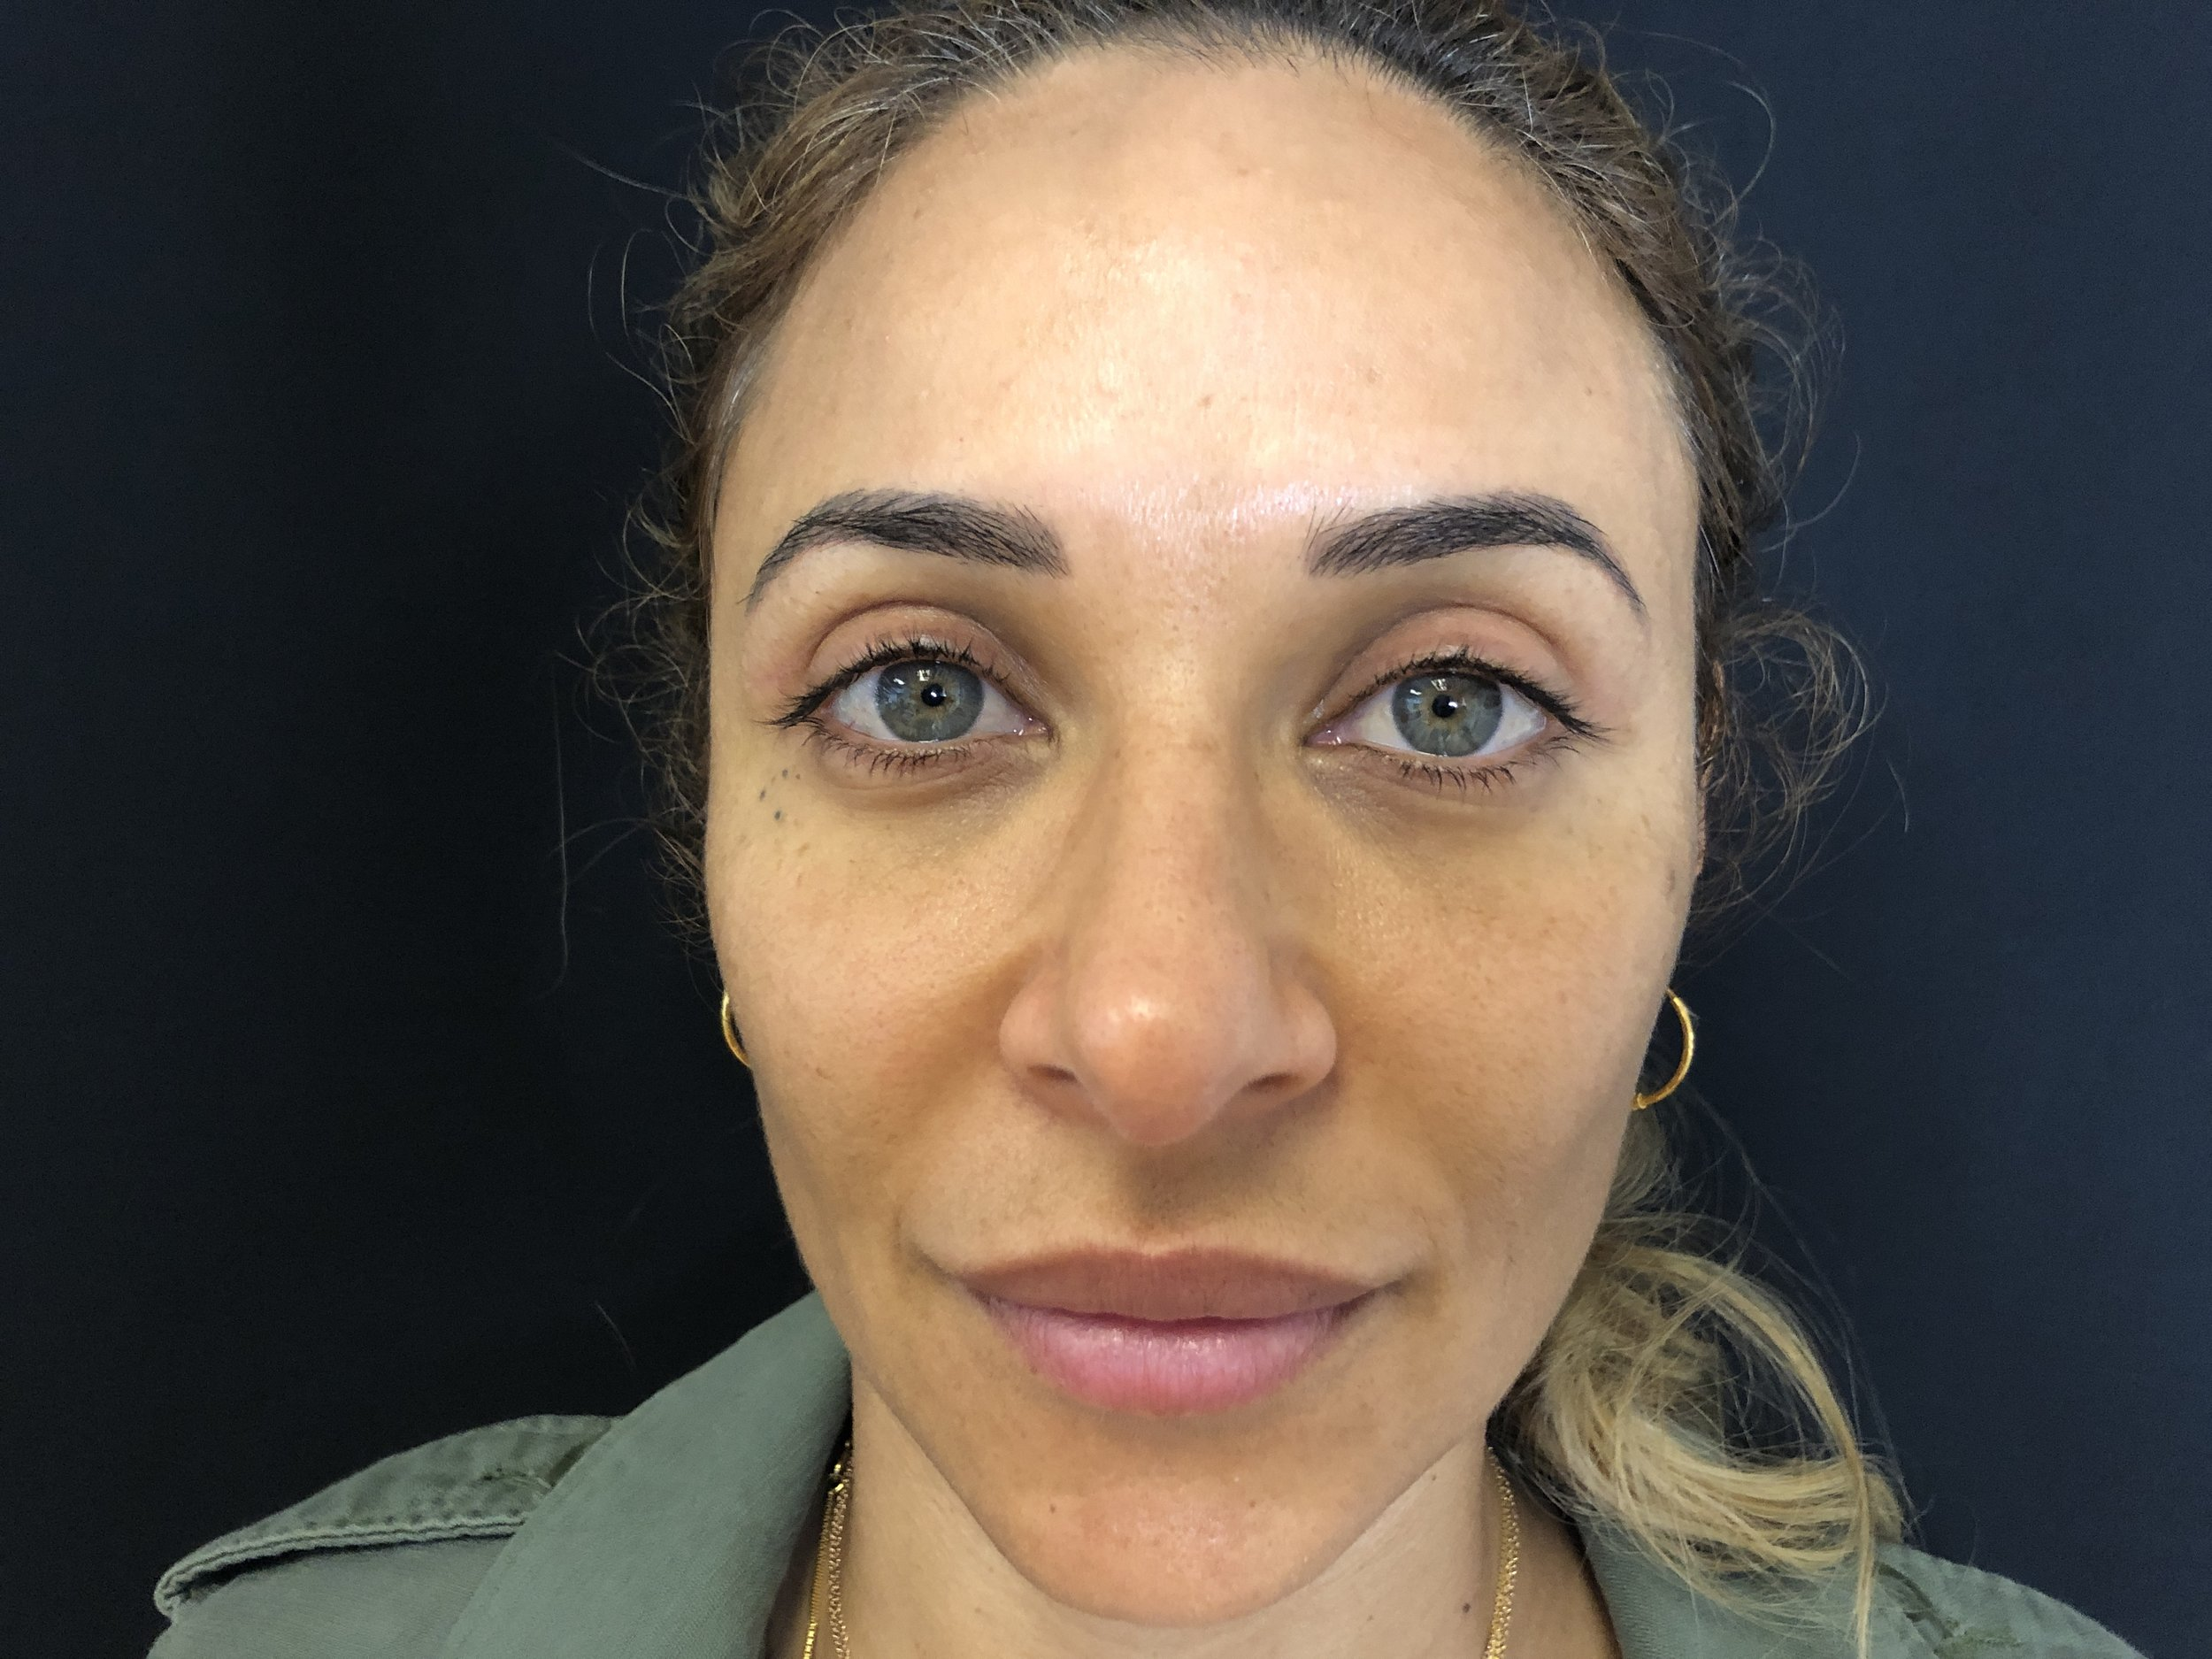 Upper Eyelid, Before